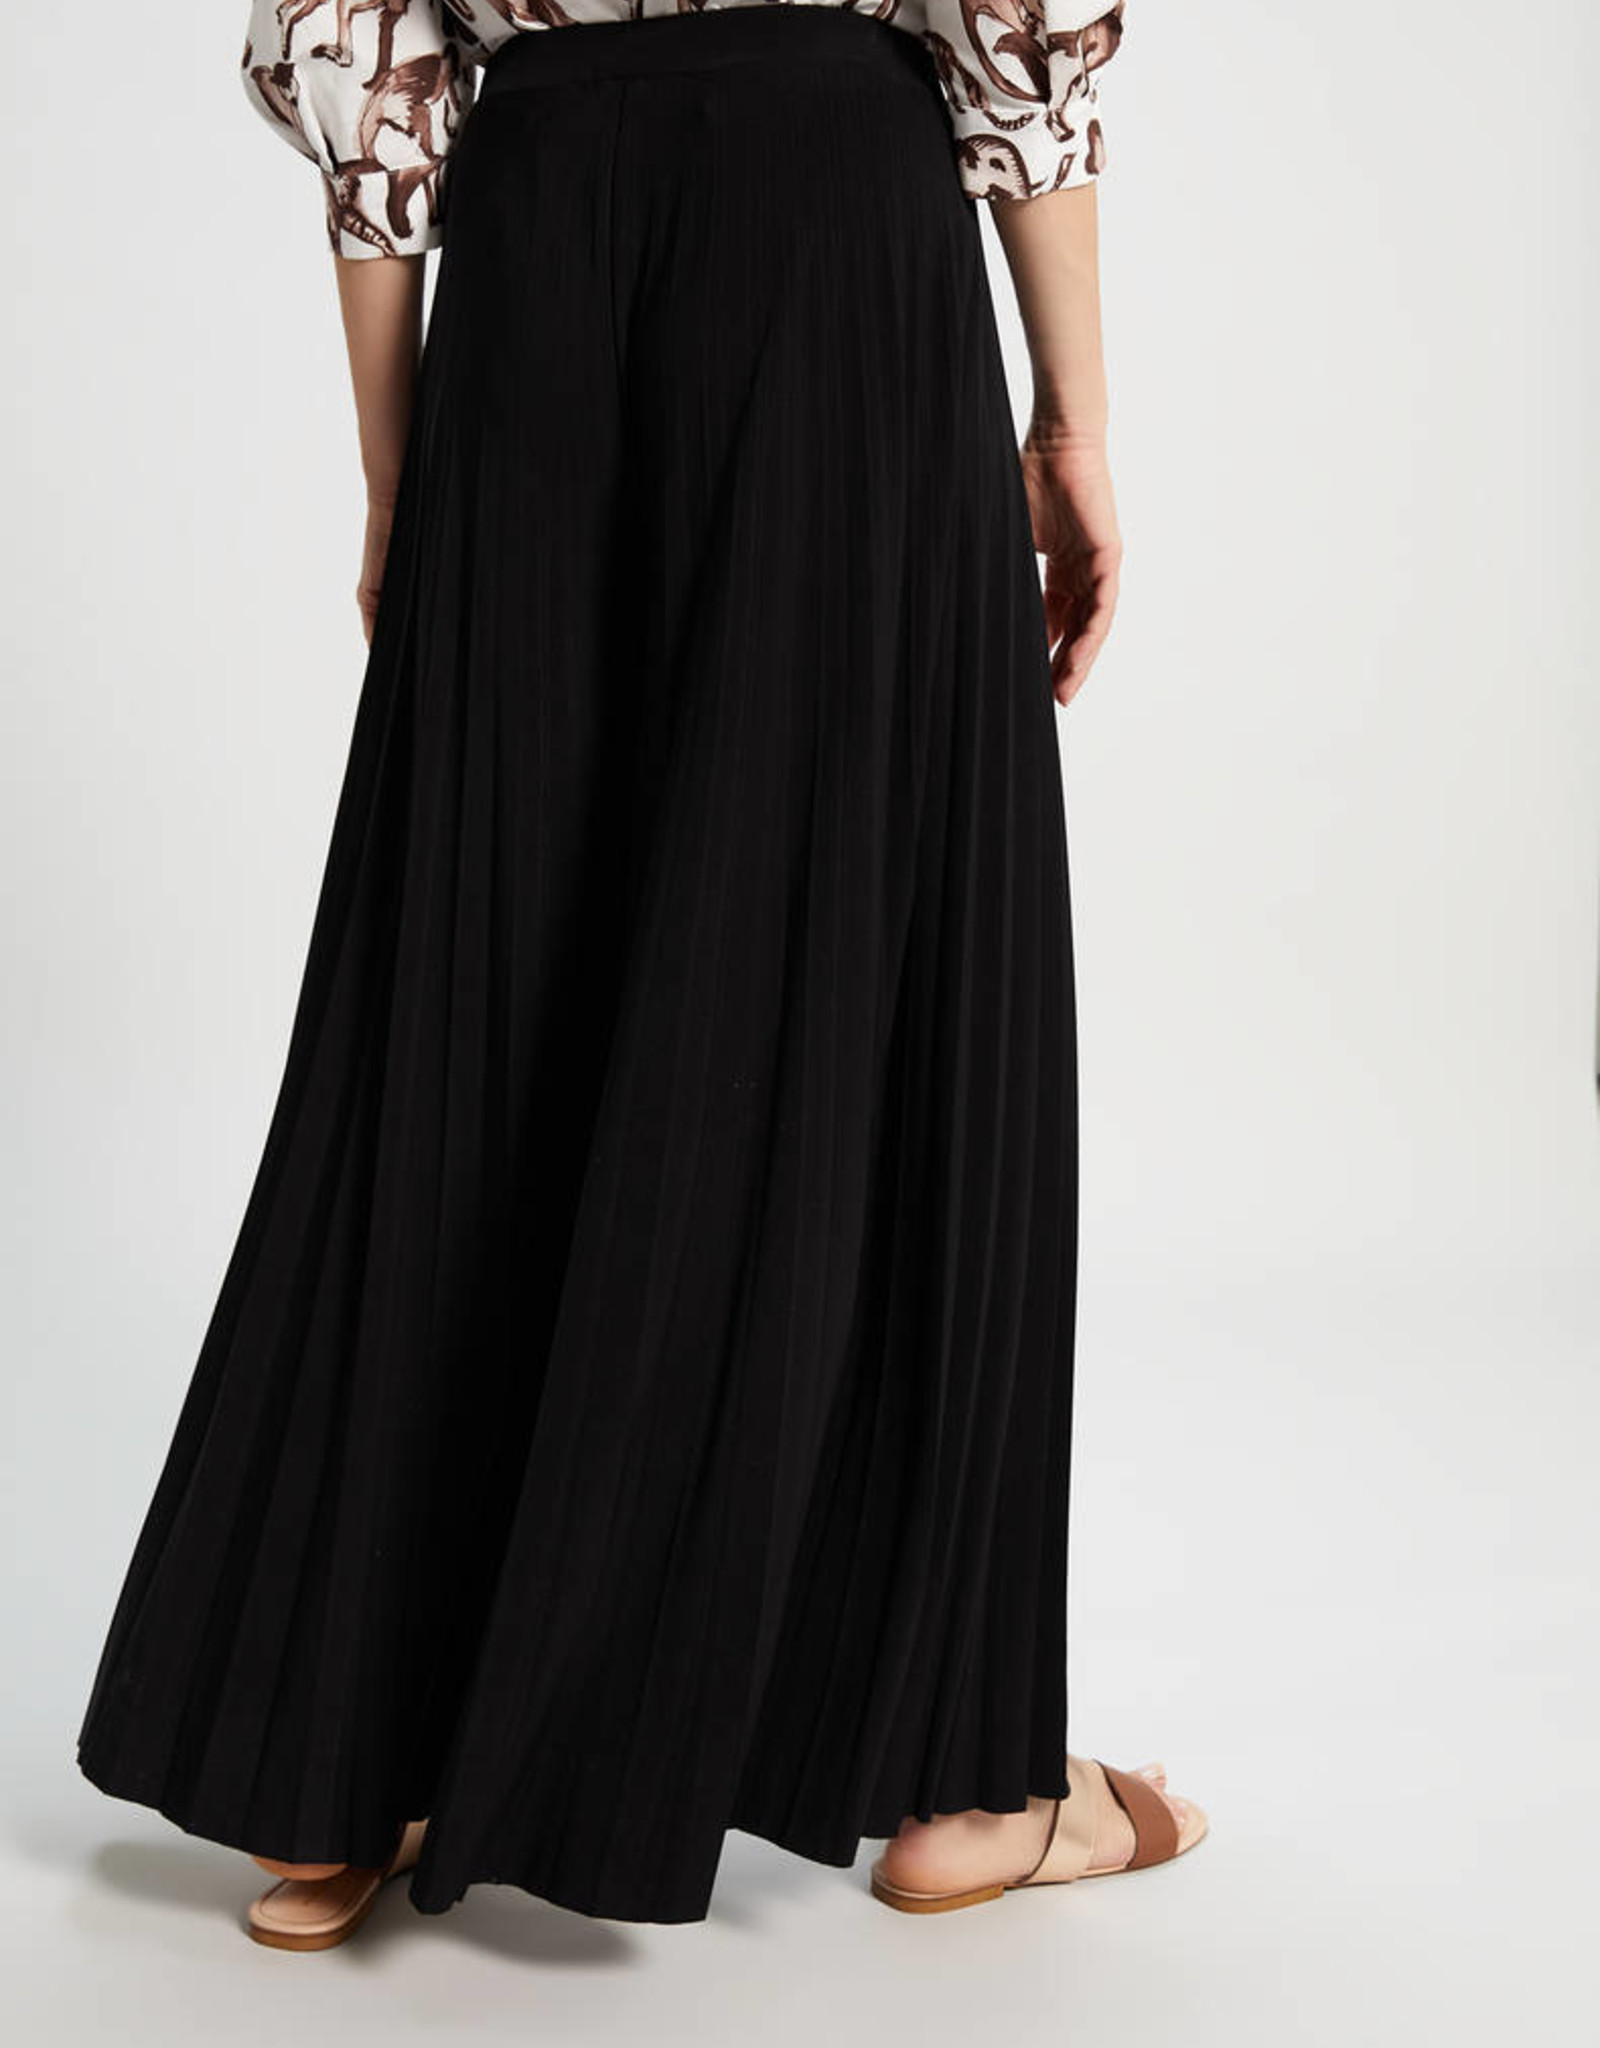 PENNYBLACK Pantalon Plissee Black Noce